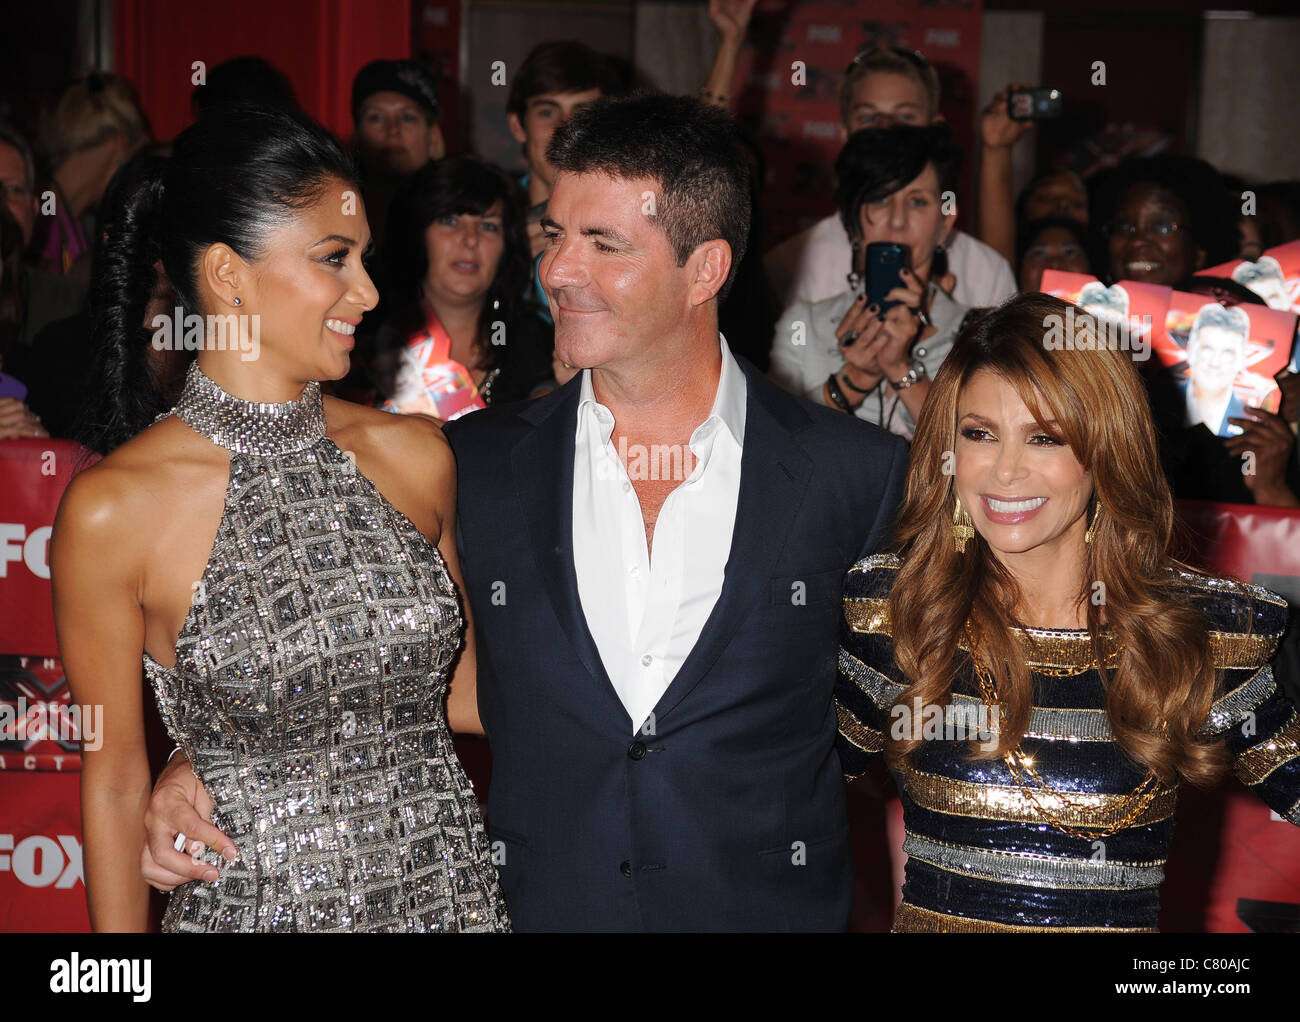 THE X FACTOR (US) Simon Cowell judges singer Paula Abdul ...